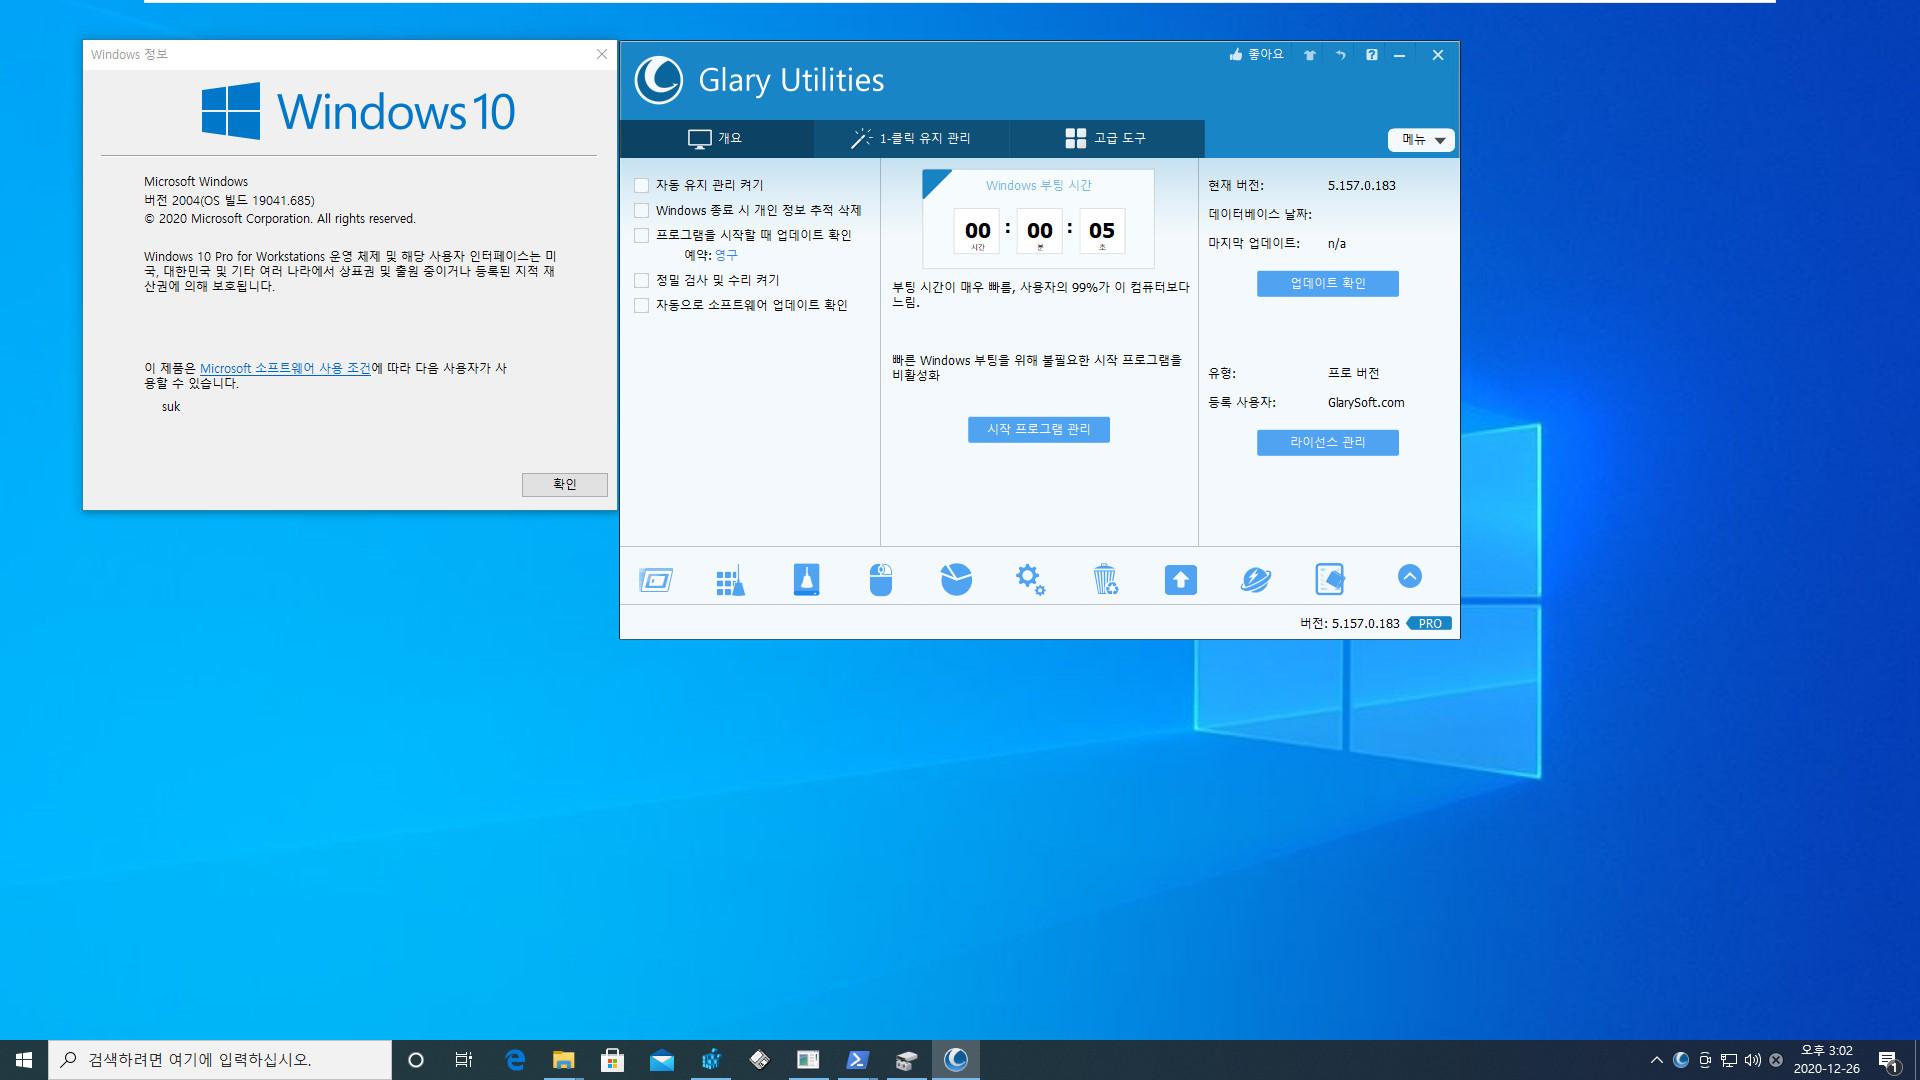 glary utilities의 윈도우 부팅 시간 테스트 - 프로그램 실행하자마자 나오는데요. 5초 - 이 시간은 현실성이 없네요 2020-12-26_150227.jpg